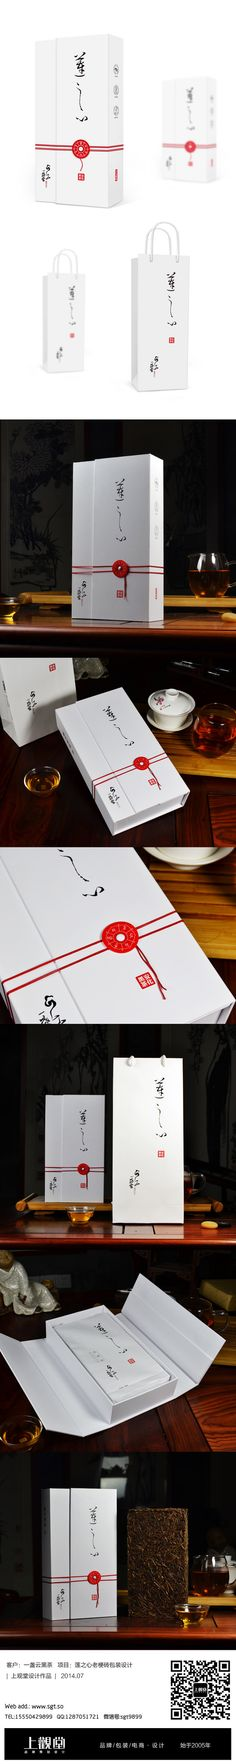 〓上观堂设计案例〓一盏云野生黑茶莲之心包...@魚羊走召采集到包裝(1597图)_花瓣平面设计 Medicine Packaging, Tea Packaging, Packaging Design, Branding Design, Tea Design, Cafe Design, Fashion Packaging, Japanese Graphic Design, Japan Design